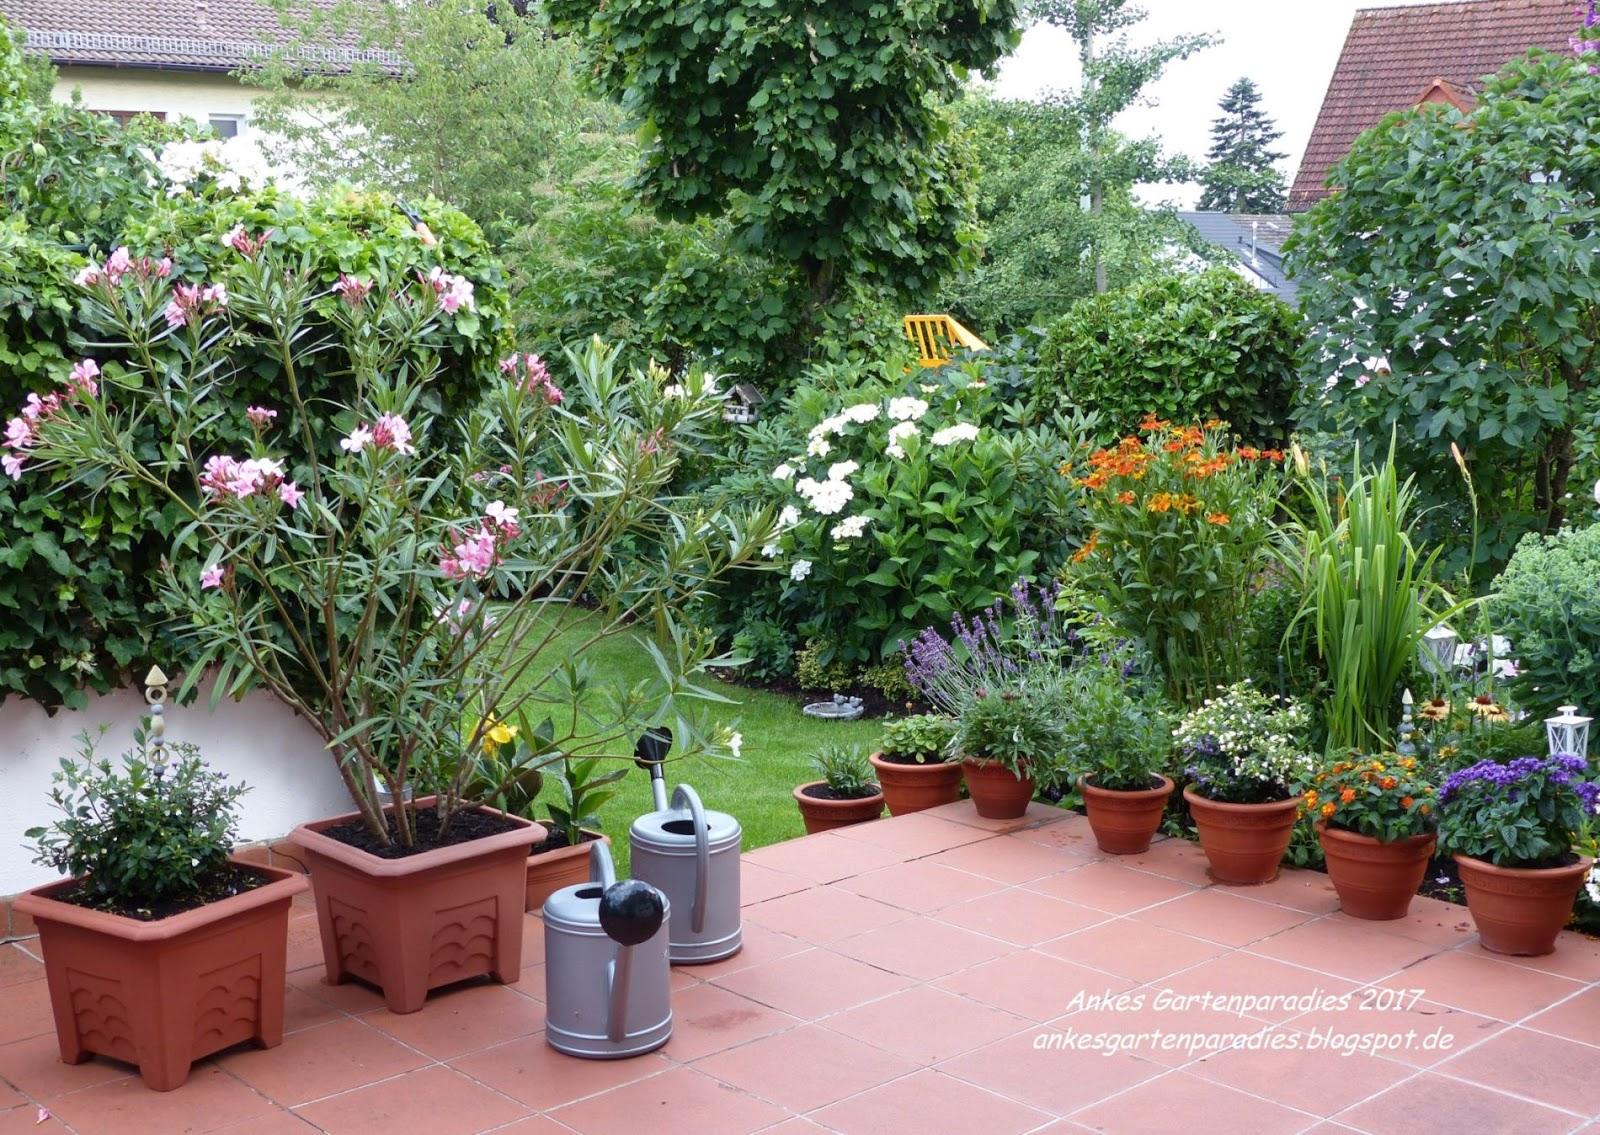 G A R T E N P A R A D I E S Bluhende Terrasse Kubelpflanzen